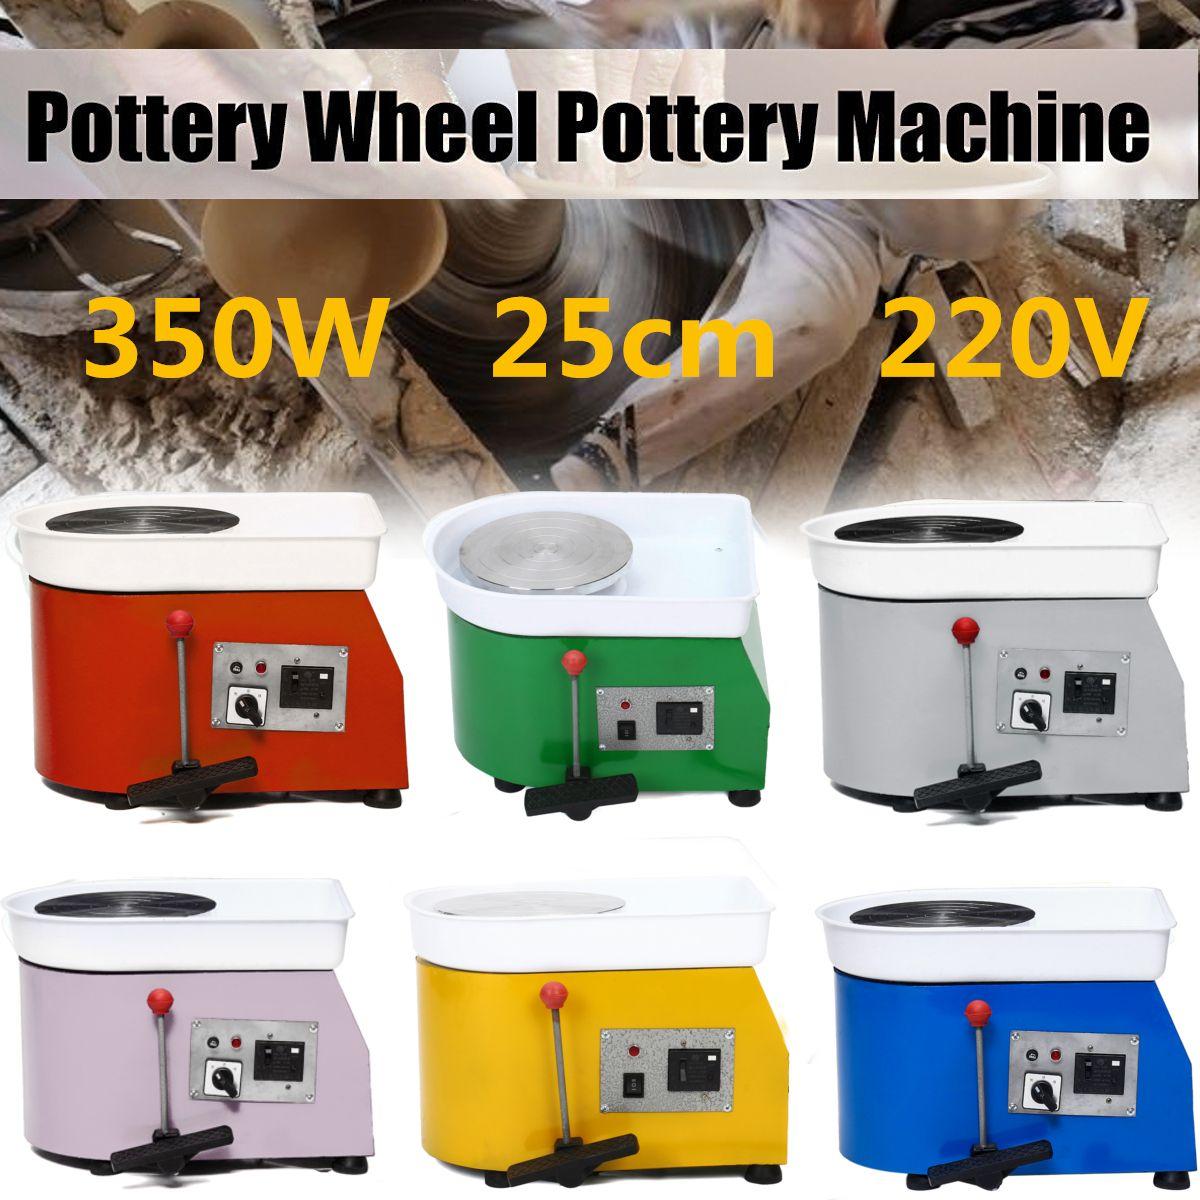 25cm 350W Pottery Wheel Pottery DIY Clay Machine For Ceramic Work Ceramics Clay 220V Children Learning Machine